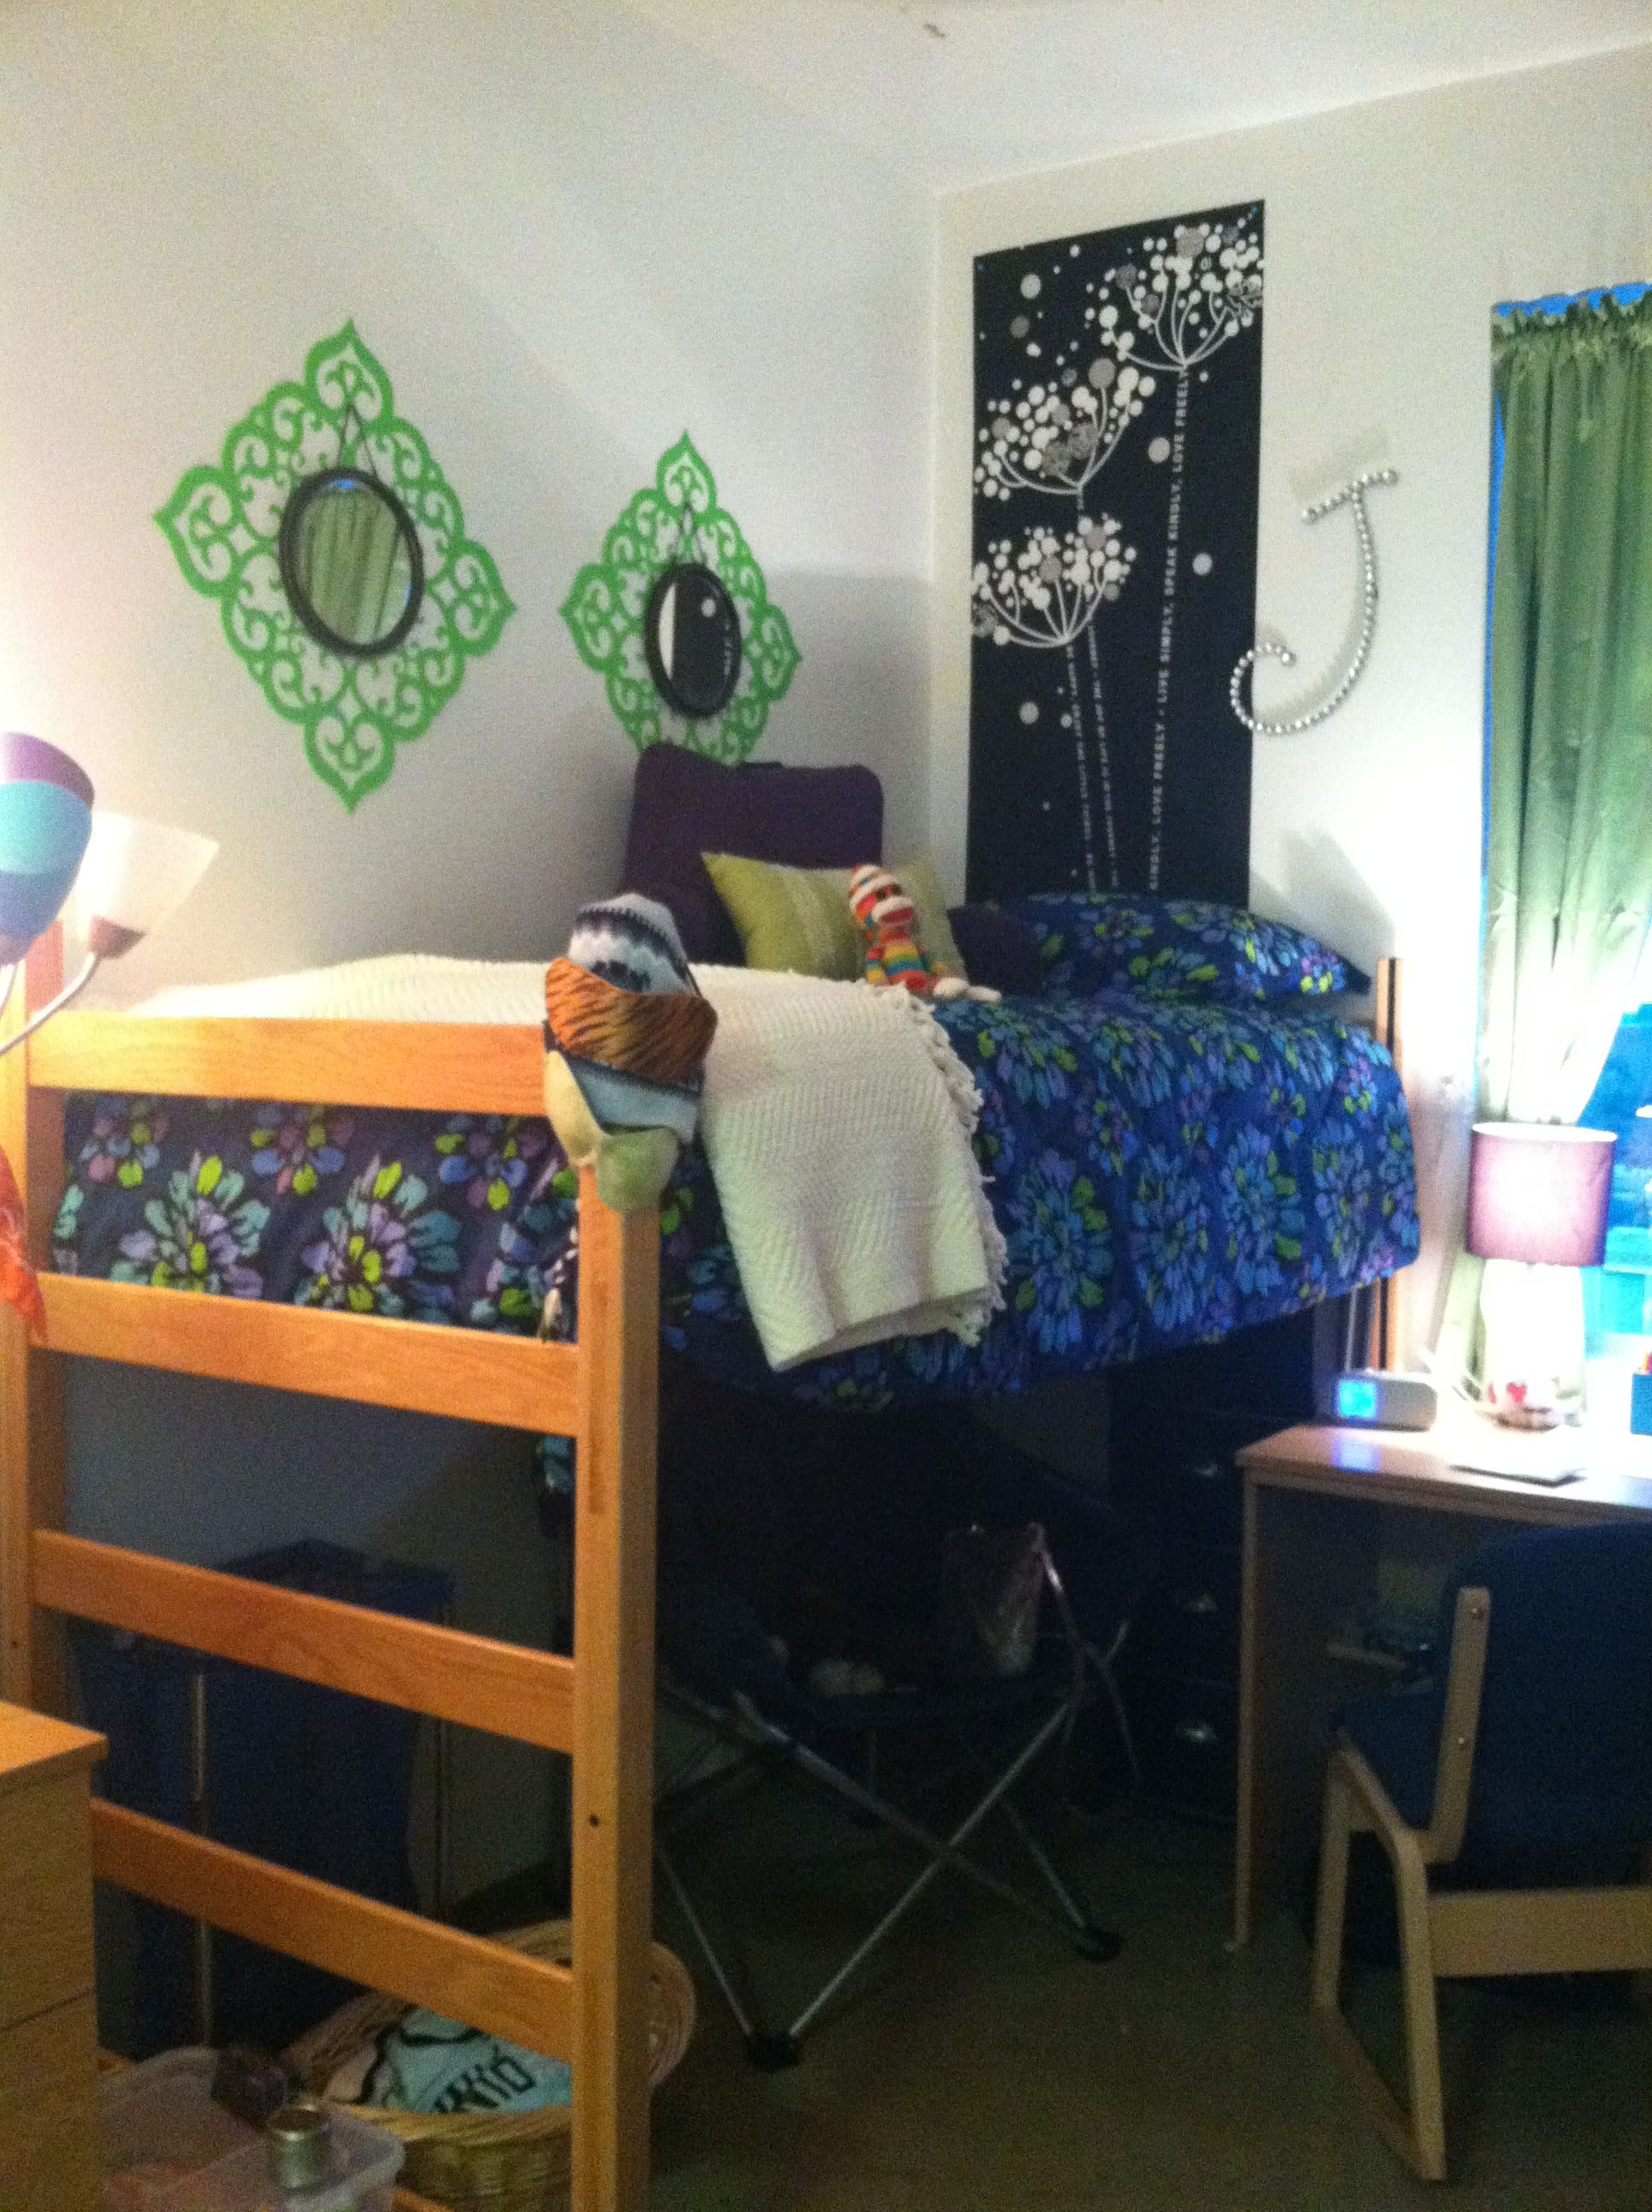 cute dorm room set up   dorm room inspiration dorm